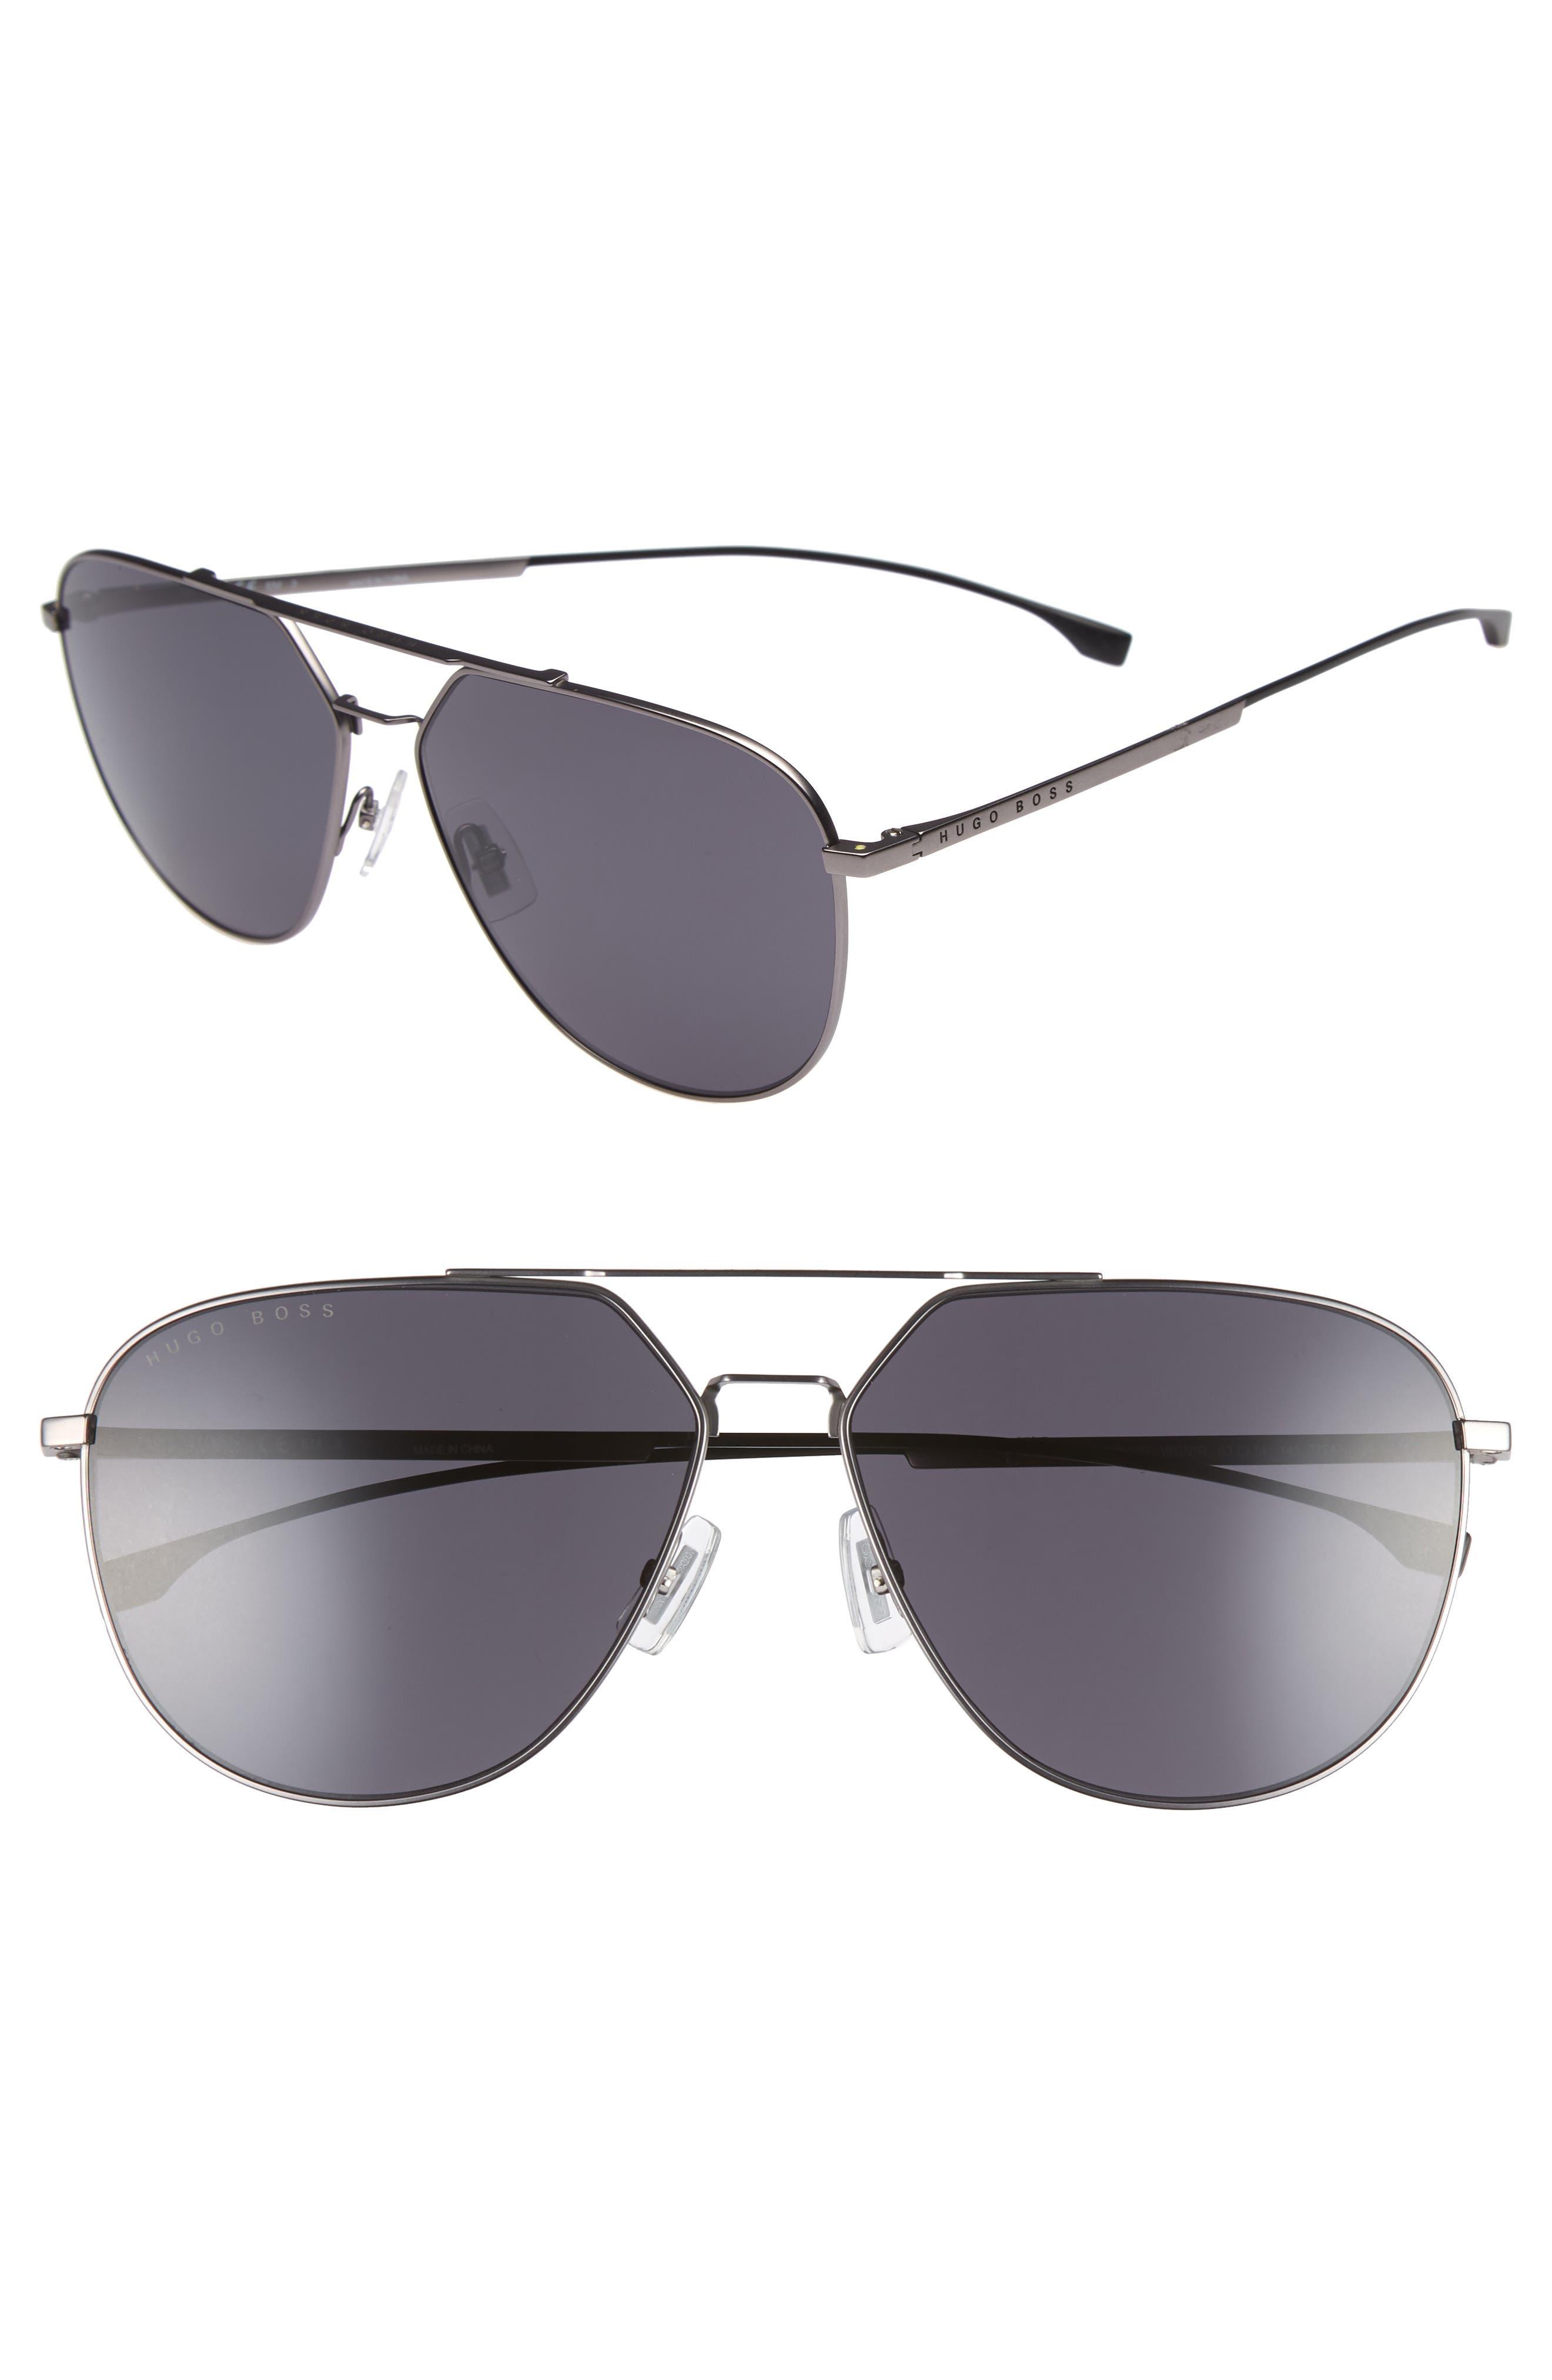 63mm Polarized Aviator Sunglasses,                             Main thumbnail 1, color,                             Matte Grey